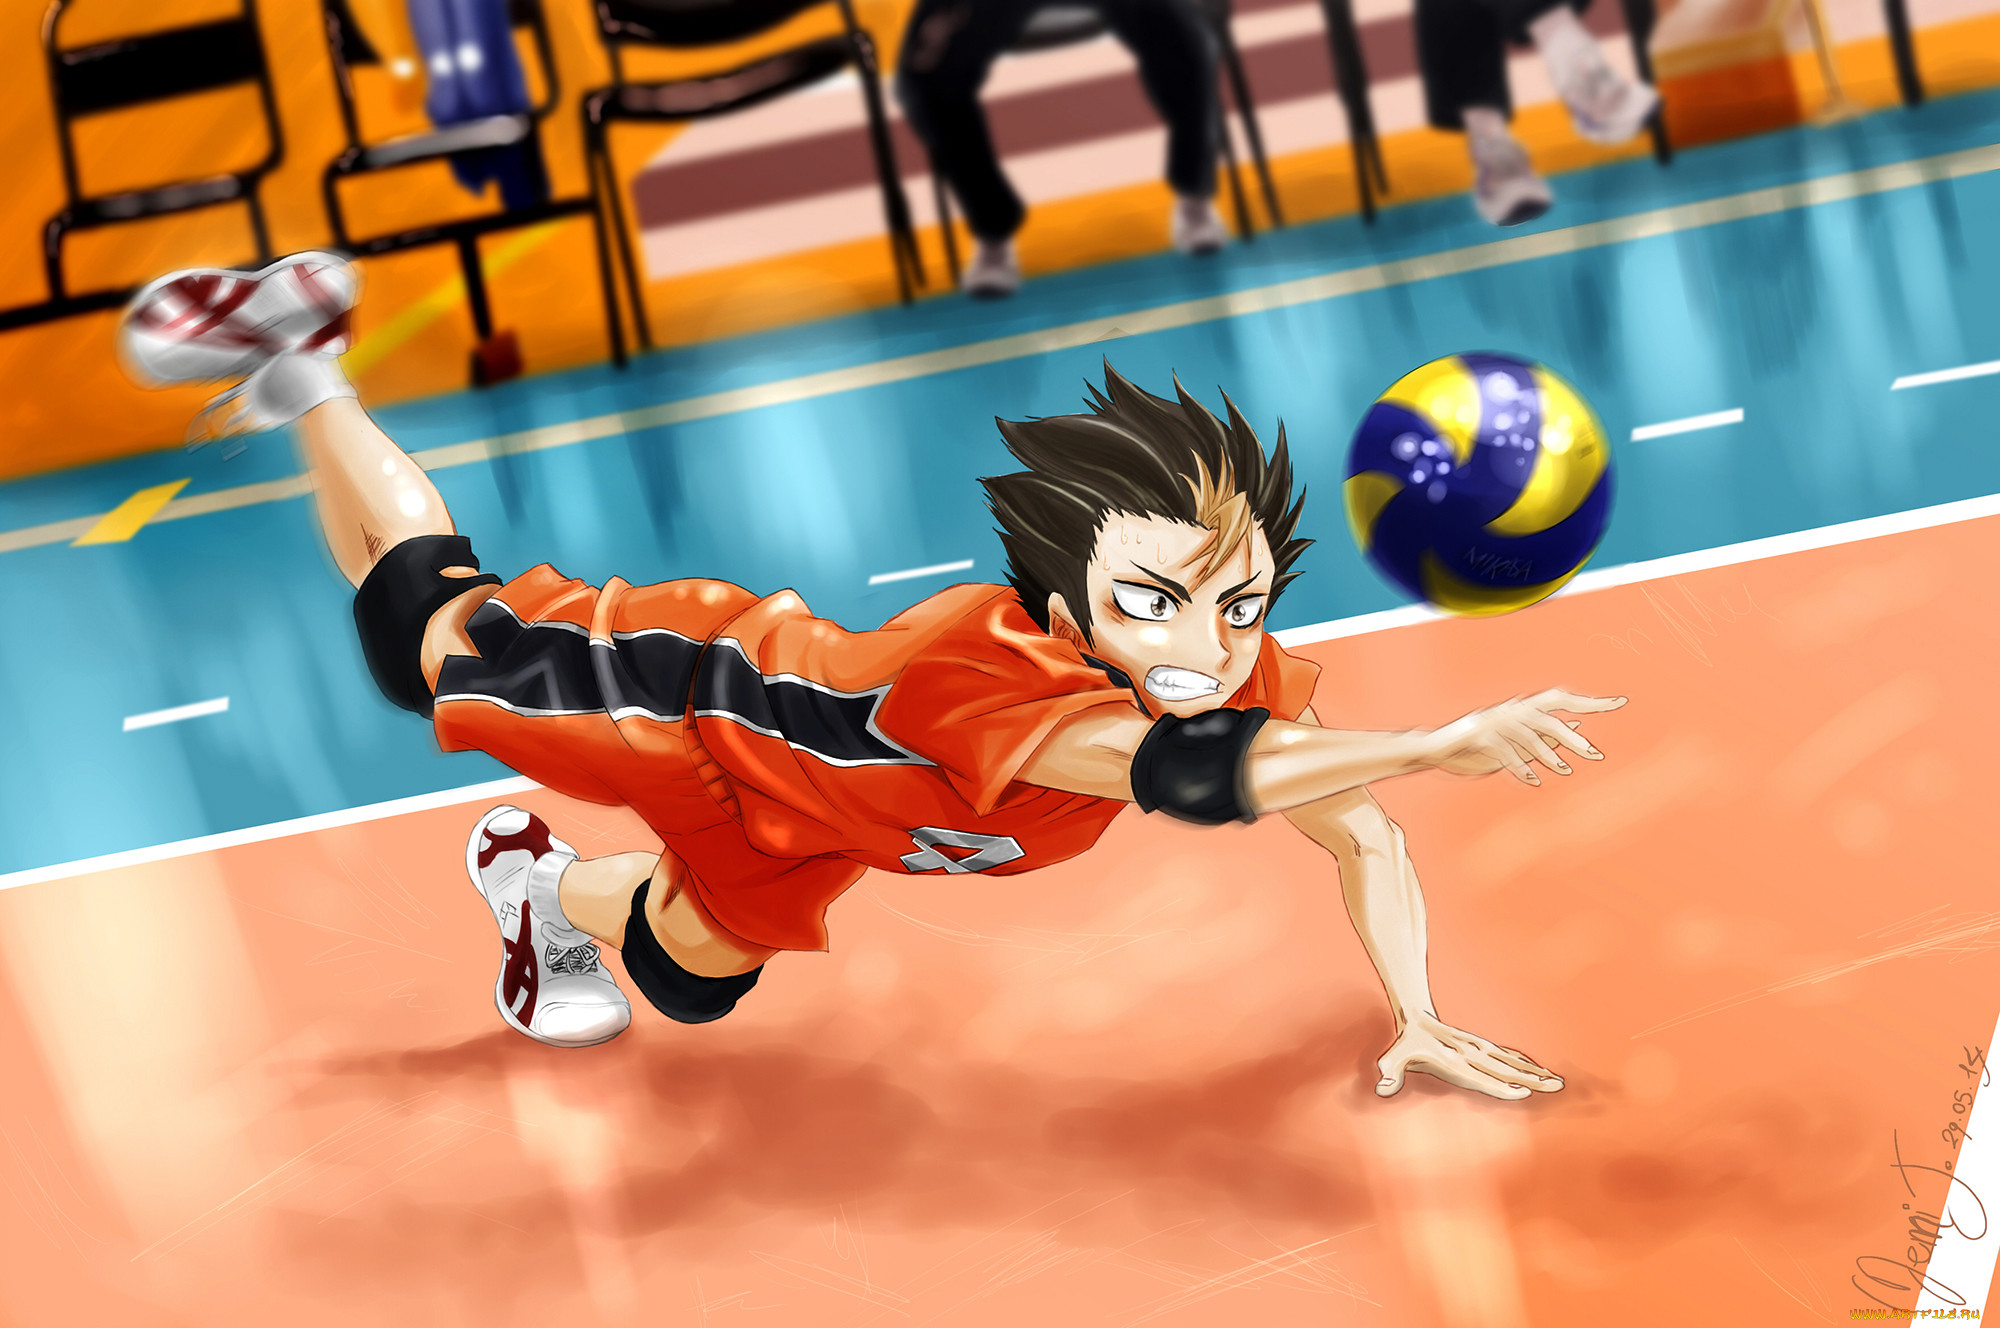 Картинки аниме про волейбол